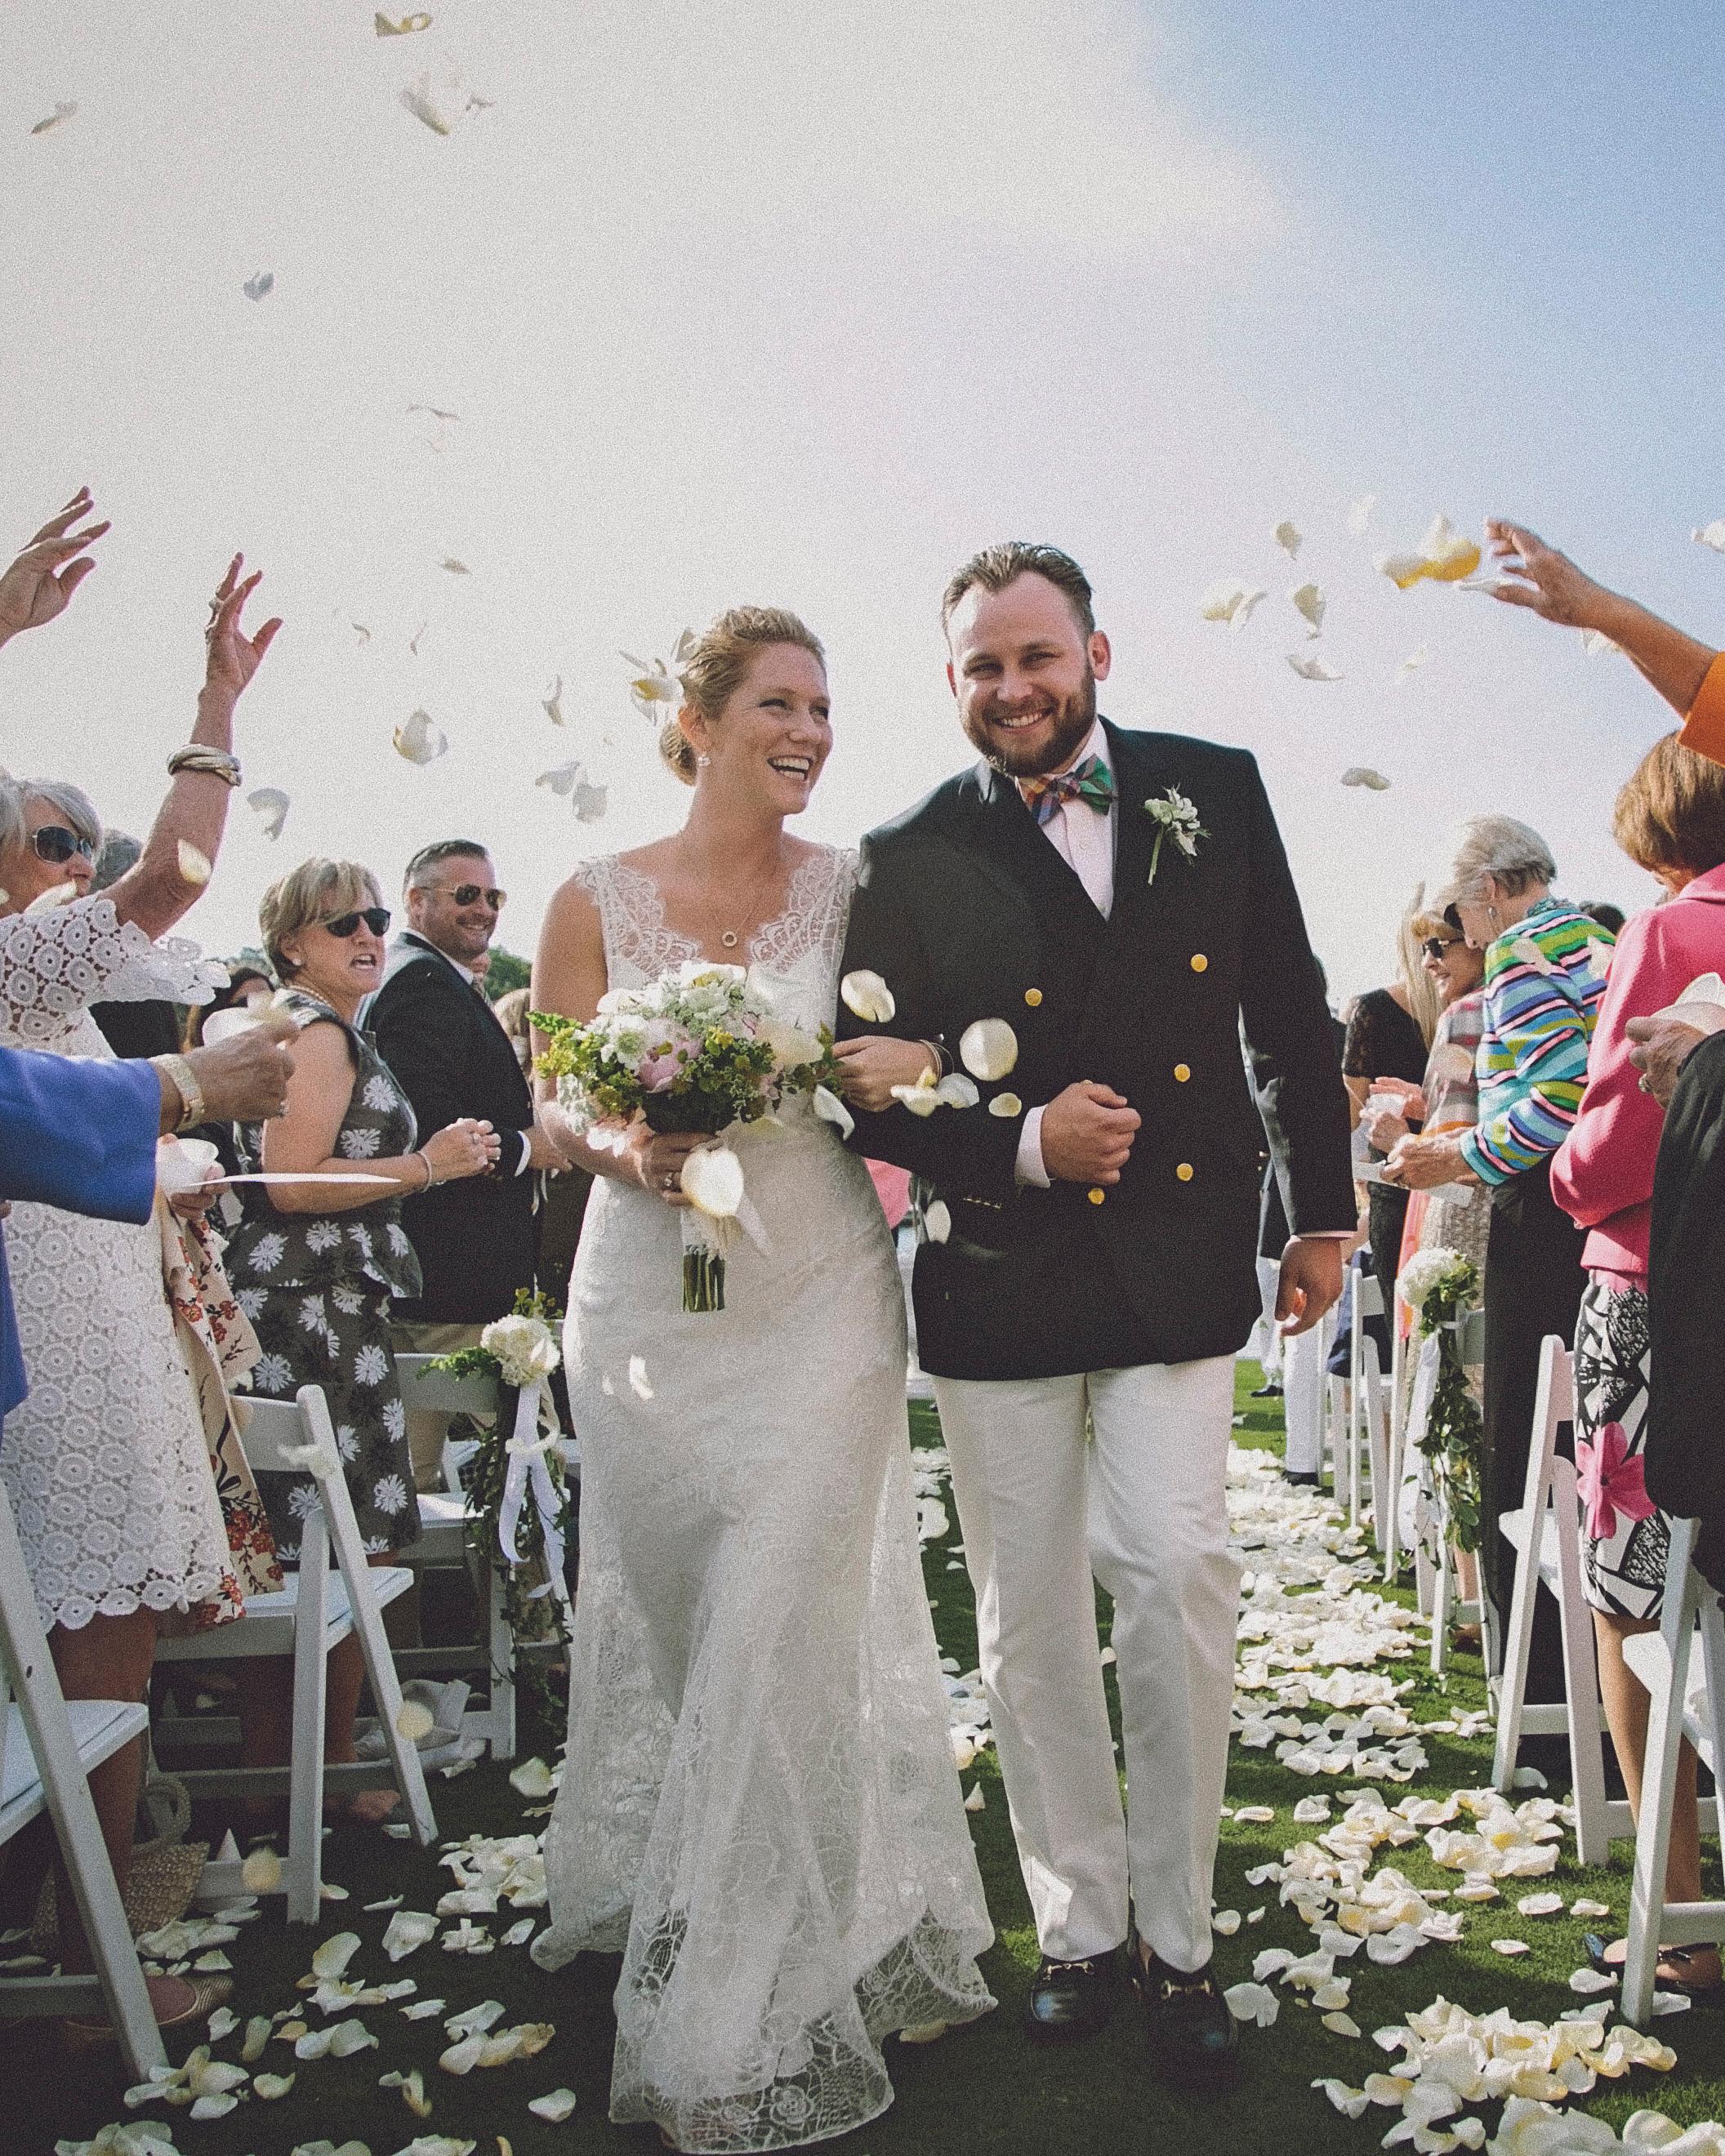 molly-greg-wedding-toss-00052-s111481-0814.jpg